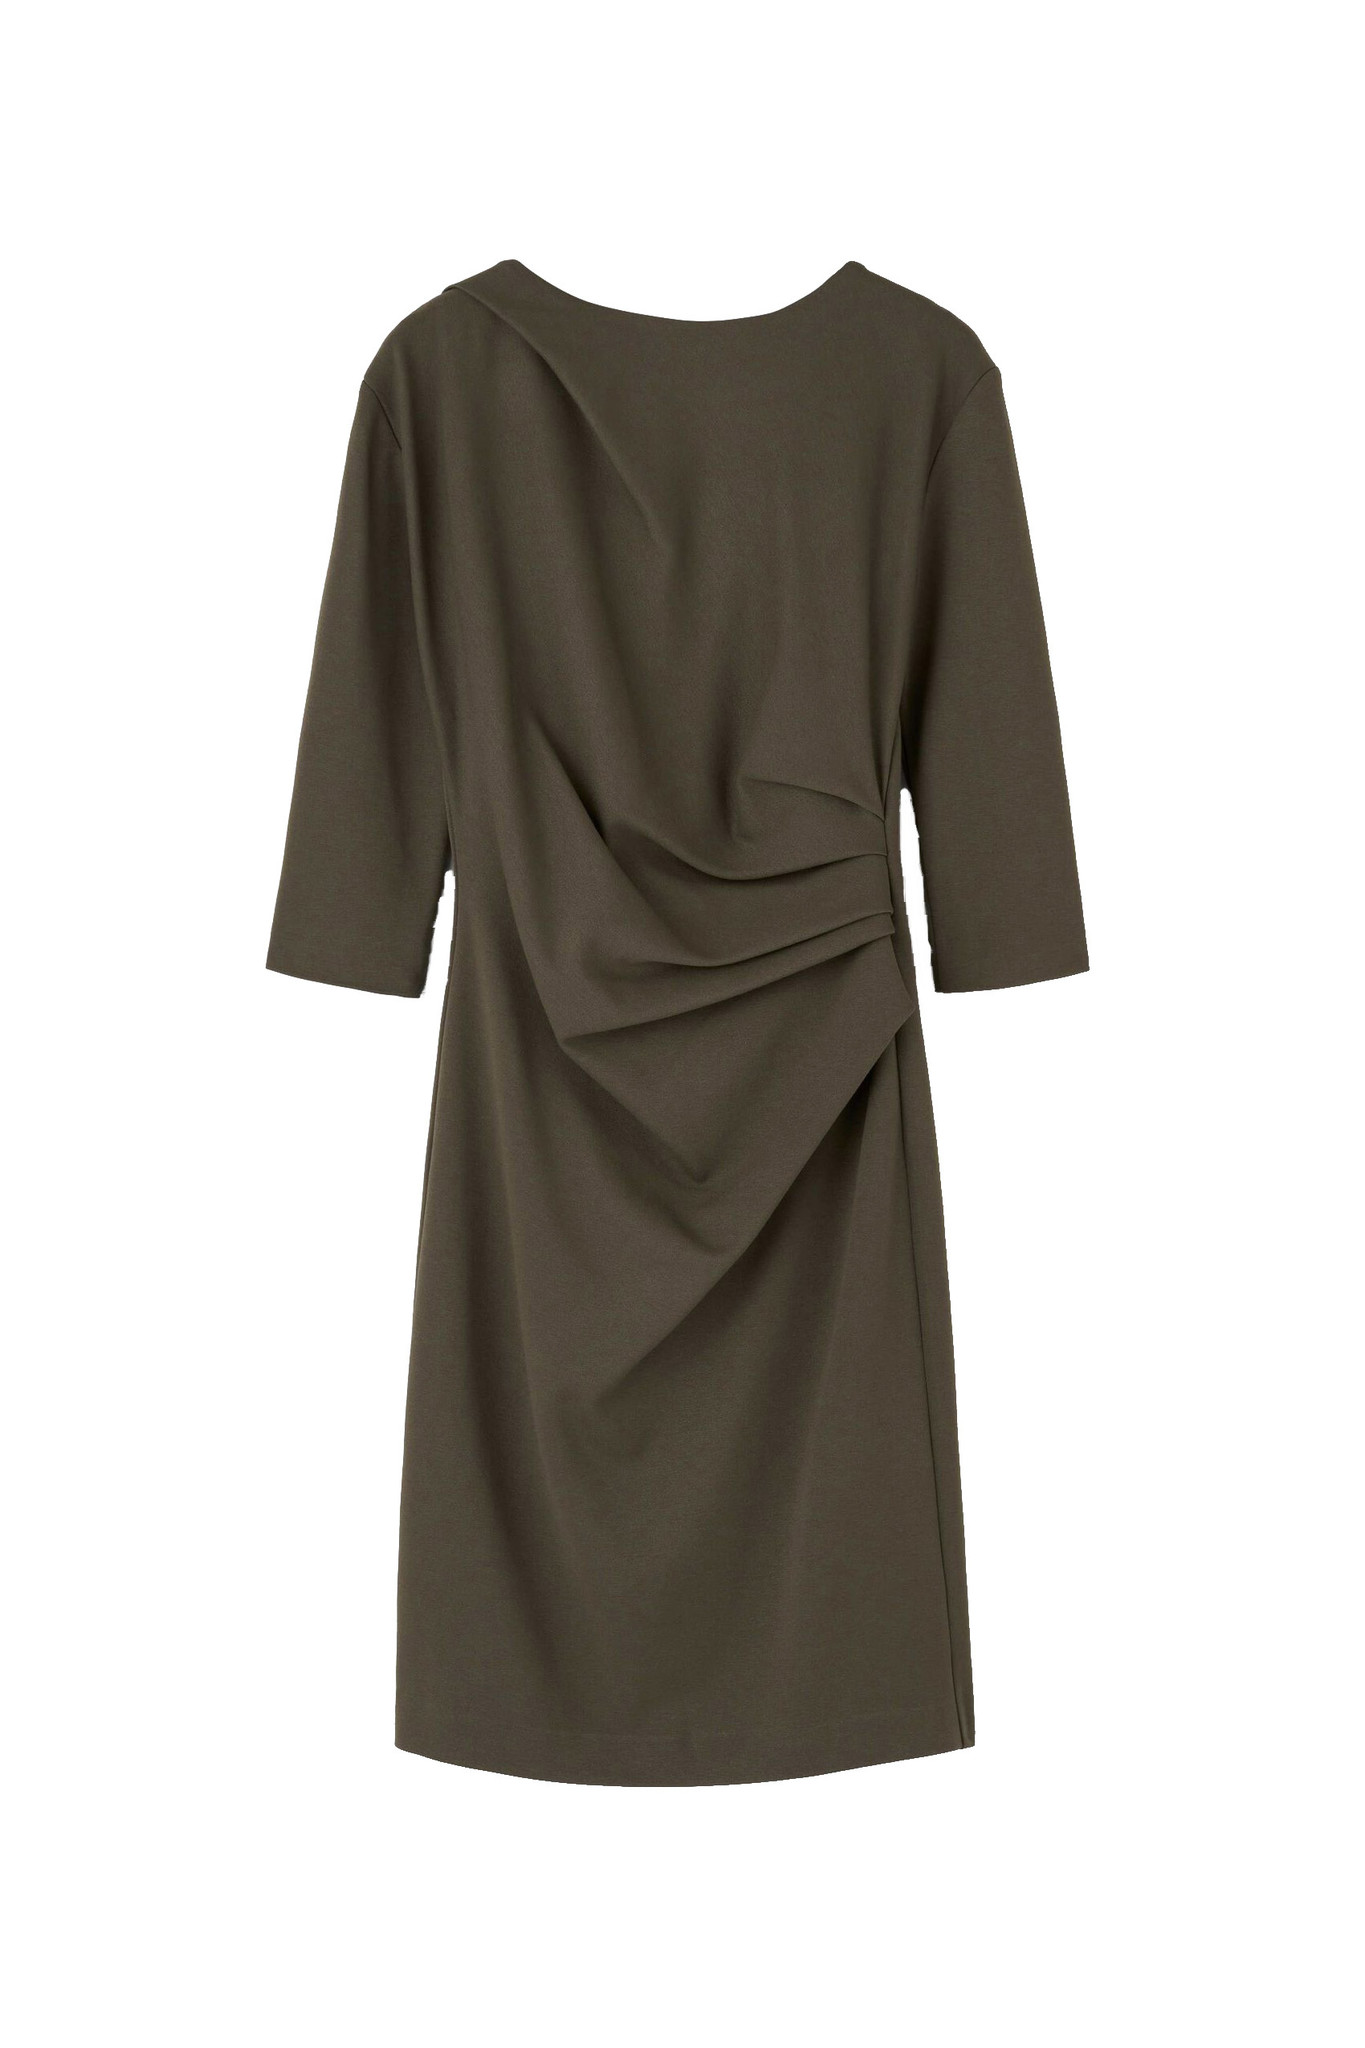 Izza S Dress - Kalamata-1